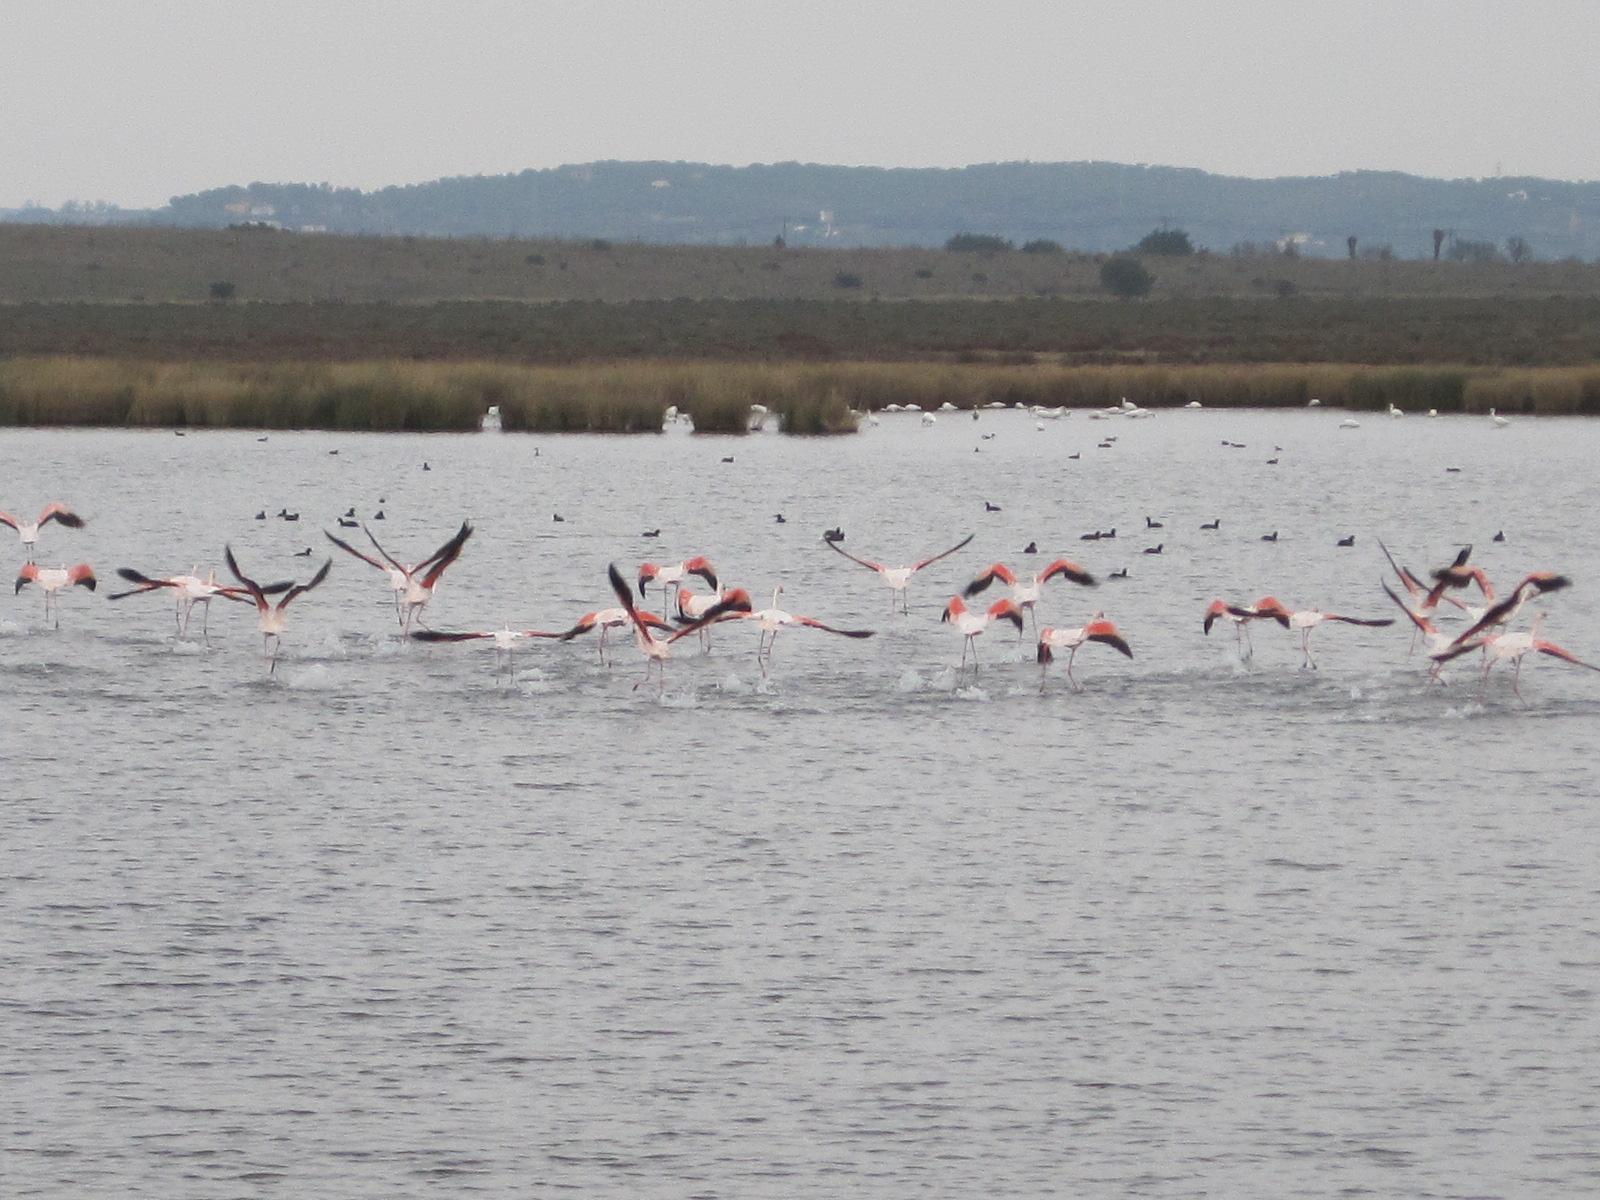 Flamingos on the salt pans (courtesy of Mike Bradley)